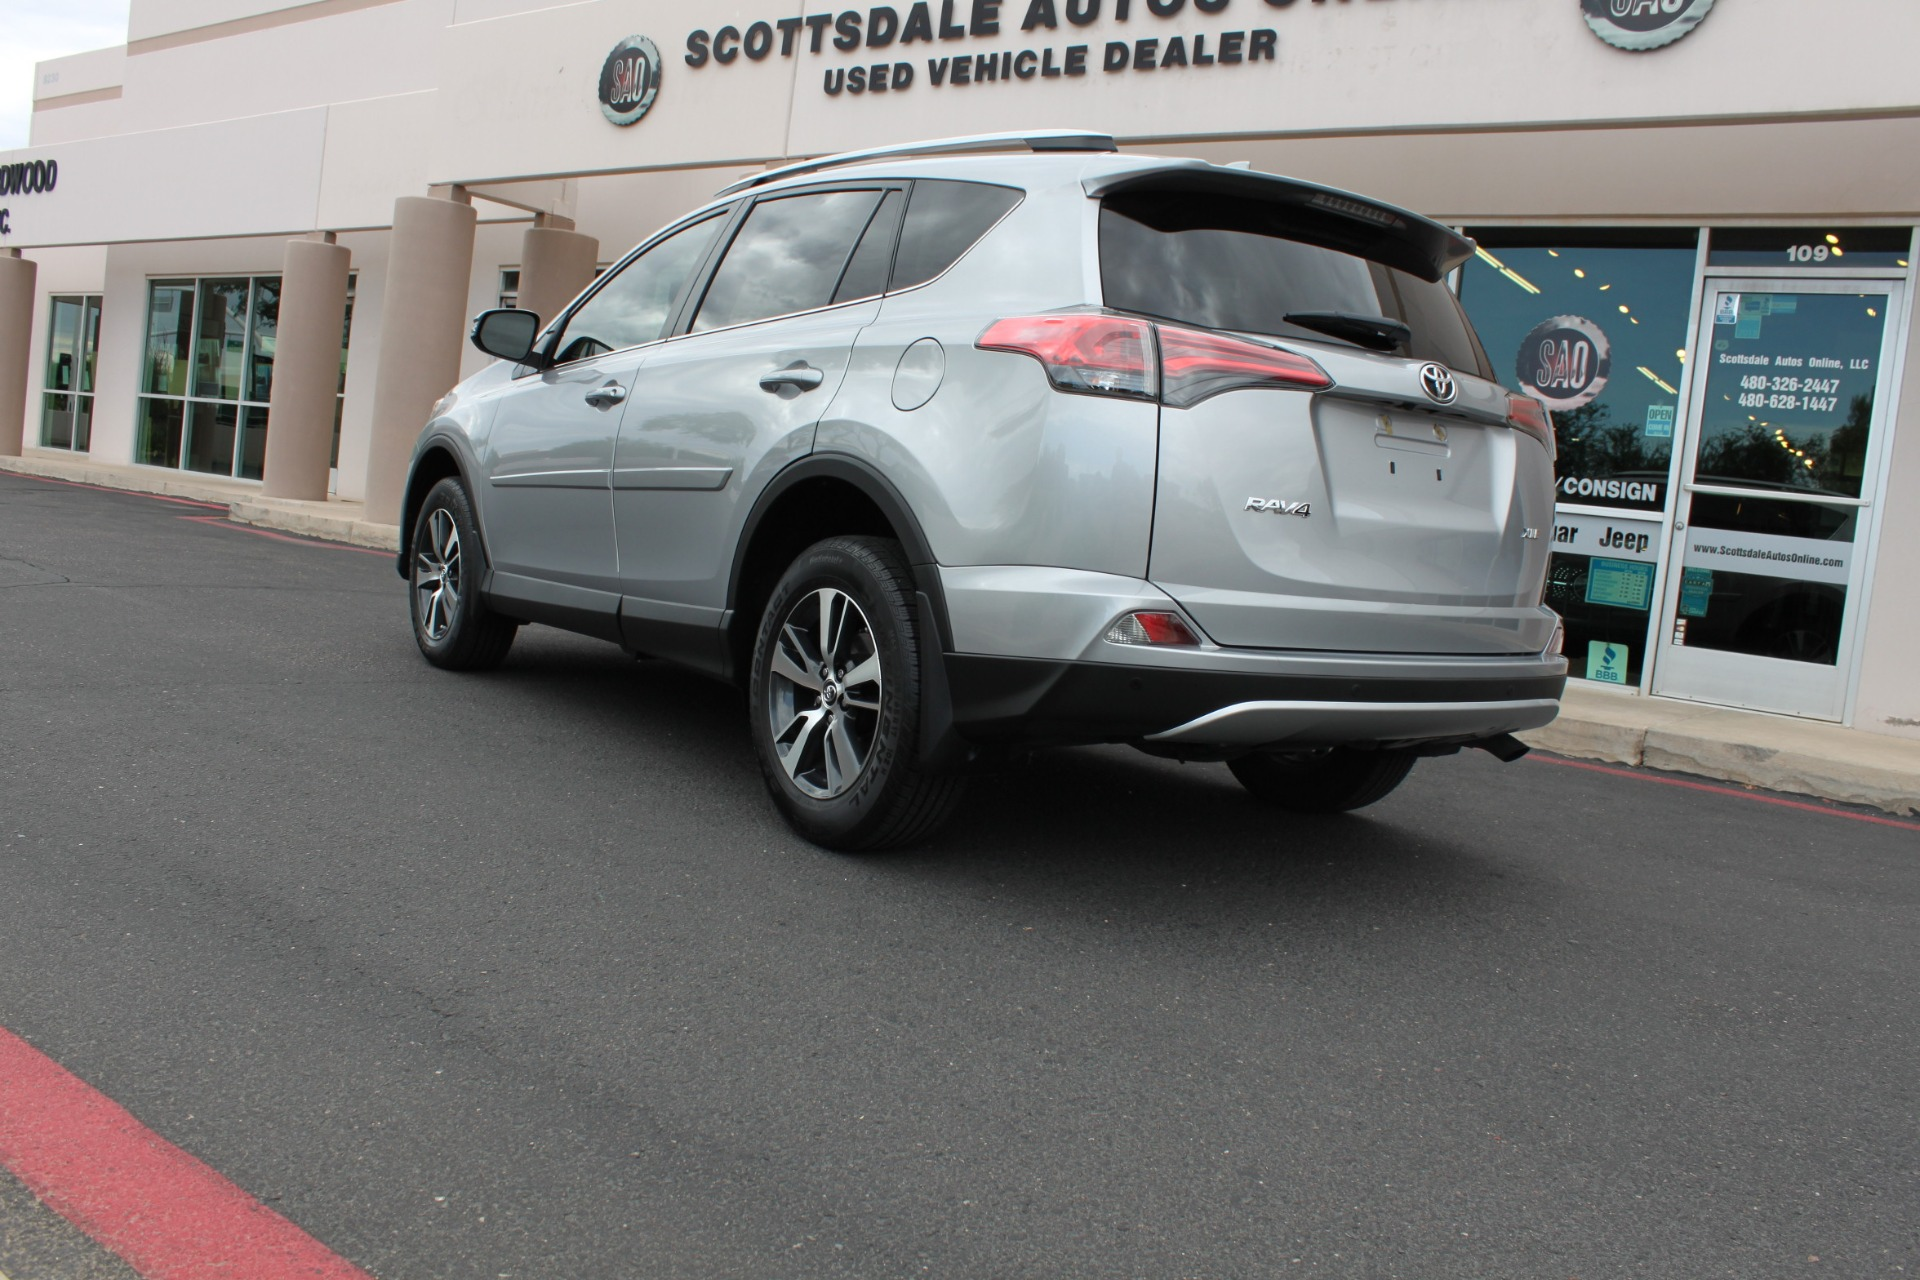 Used-2016-Toyota-RAV4-XLE-Chevelle